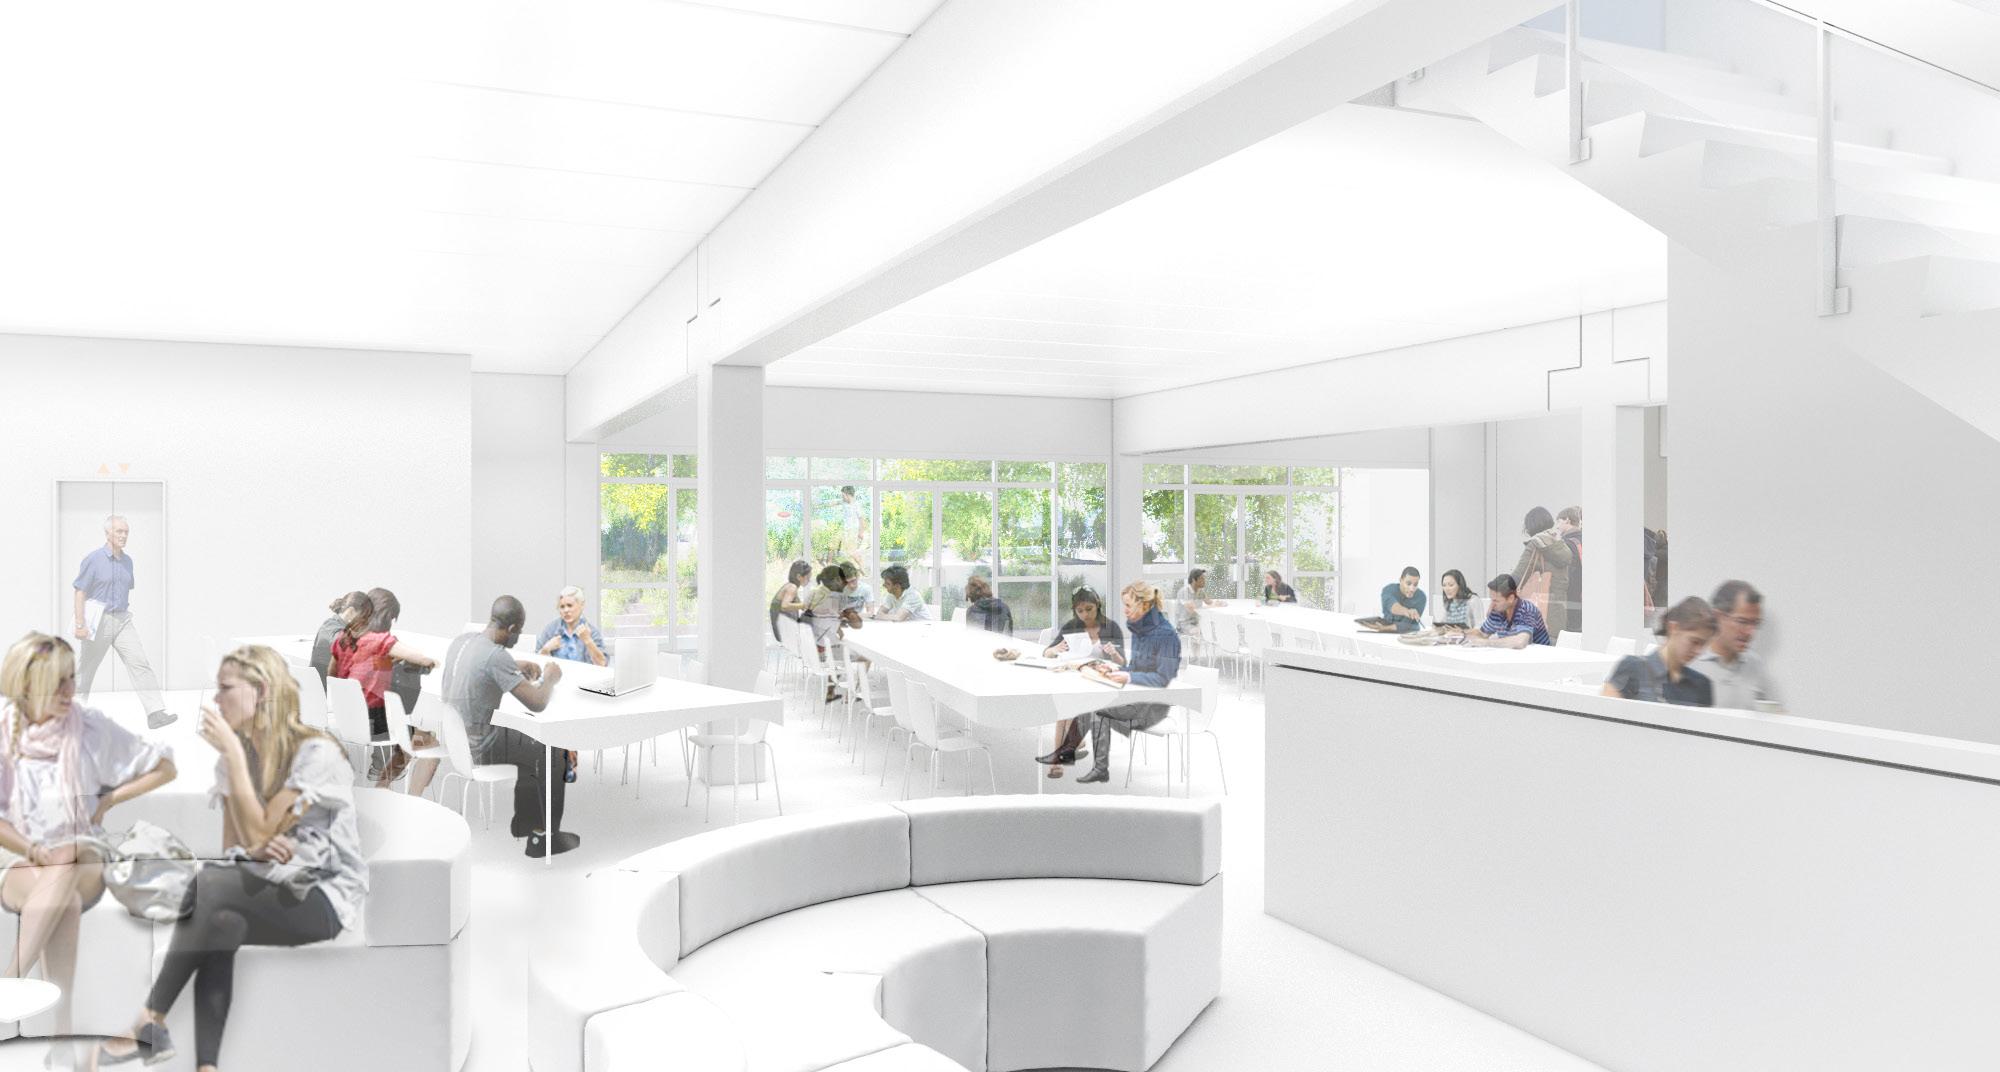 Science Center Rendering